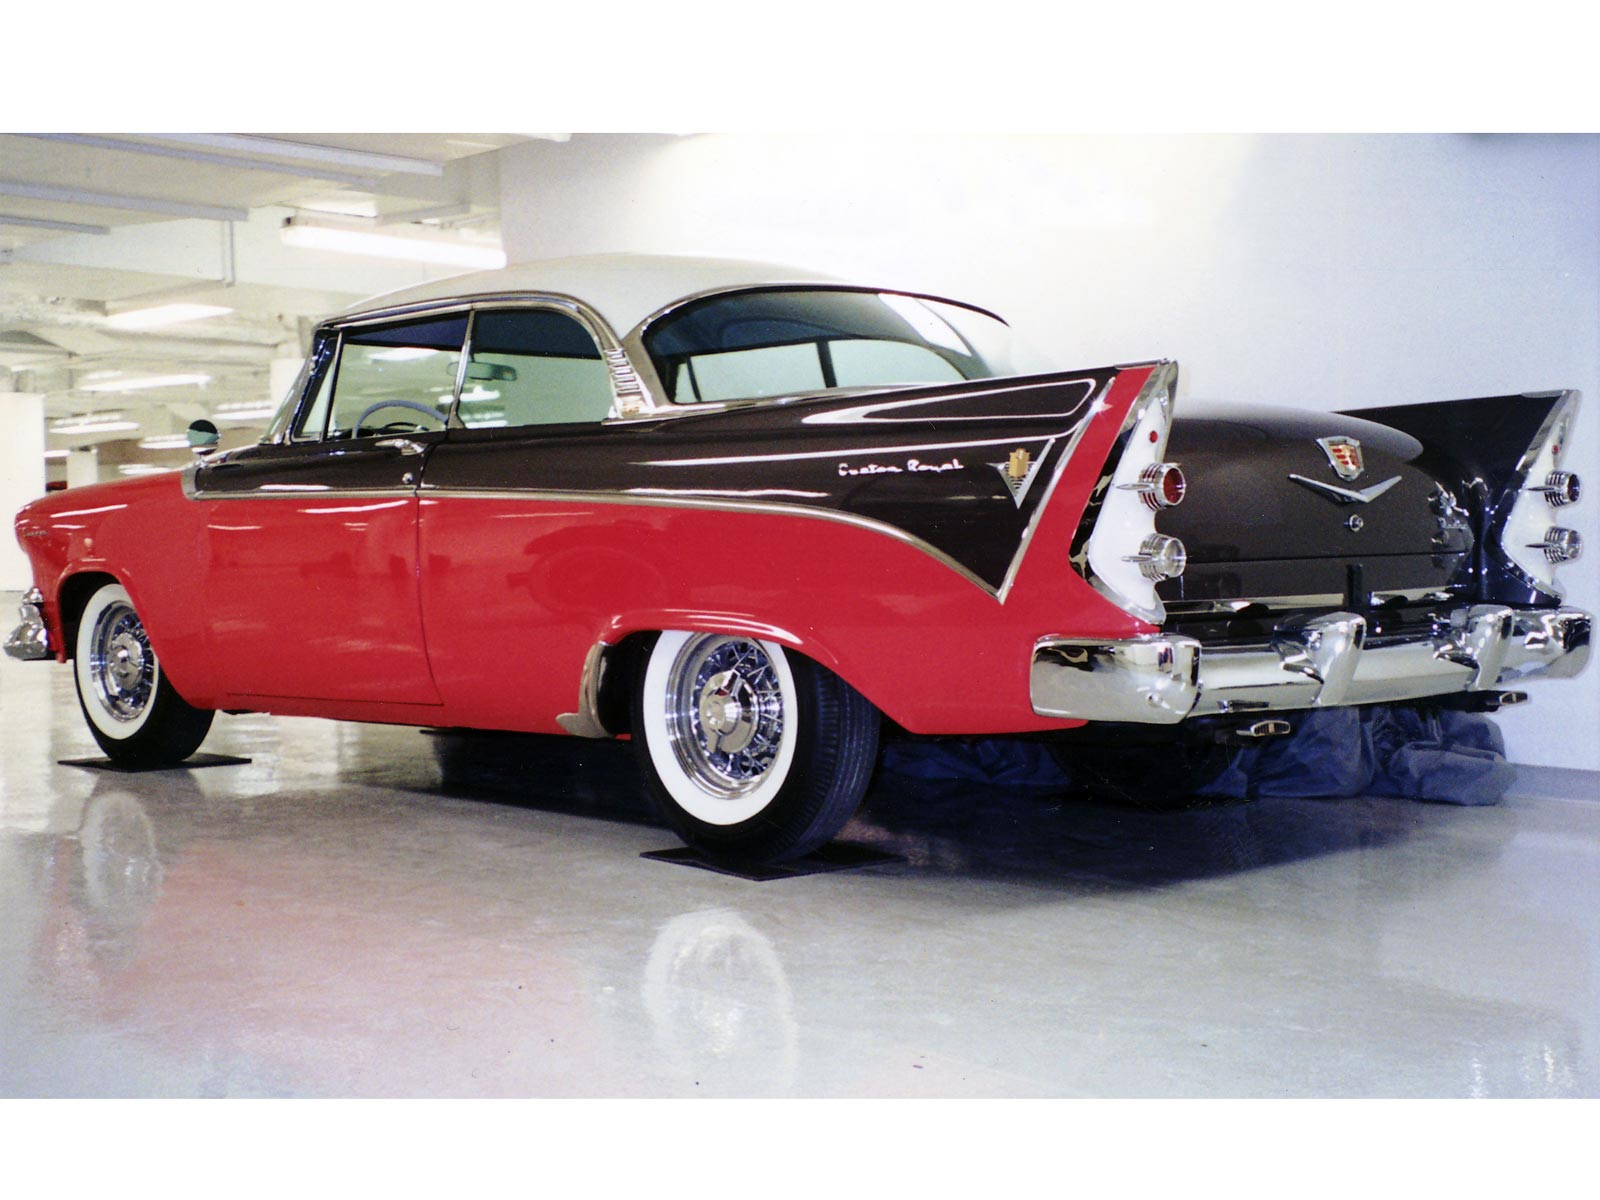 1955 dodge custom royal lancer 4 door sedan 15699 - 1955 1959 Dodge Custom Royal 1955 Dodge Custom Royal